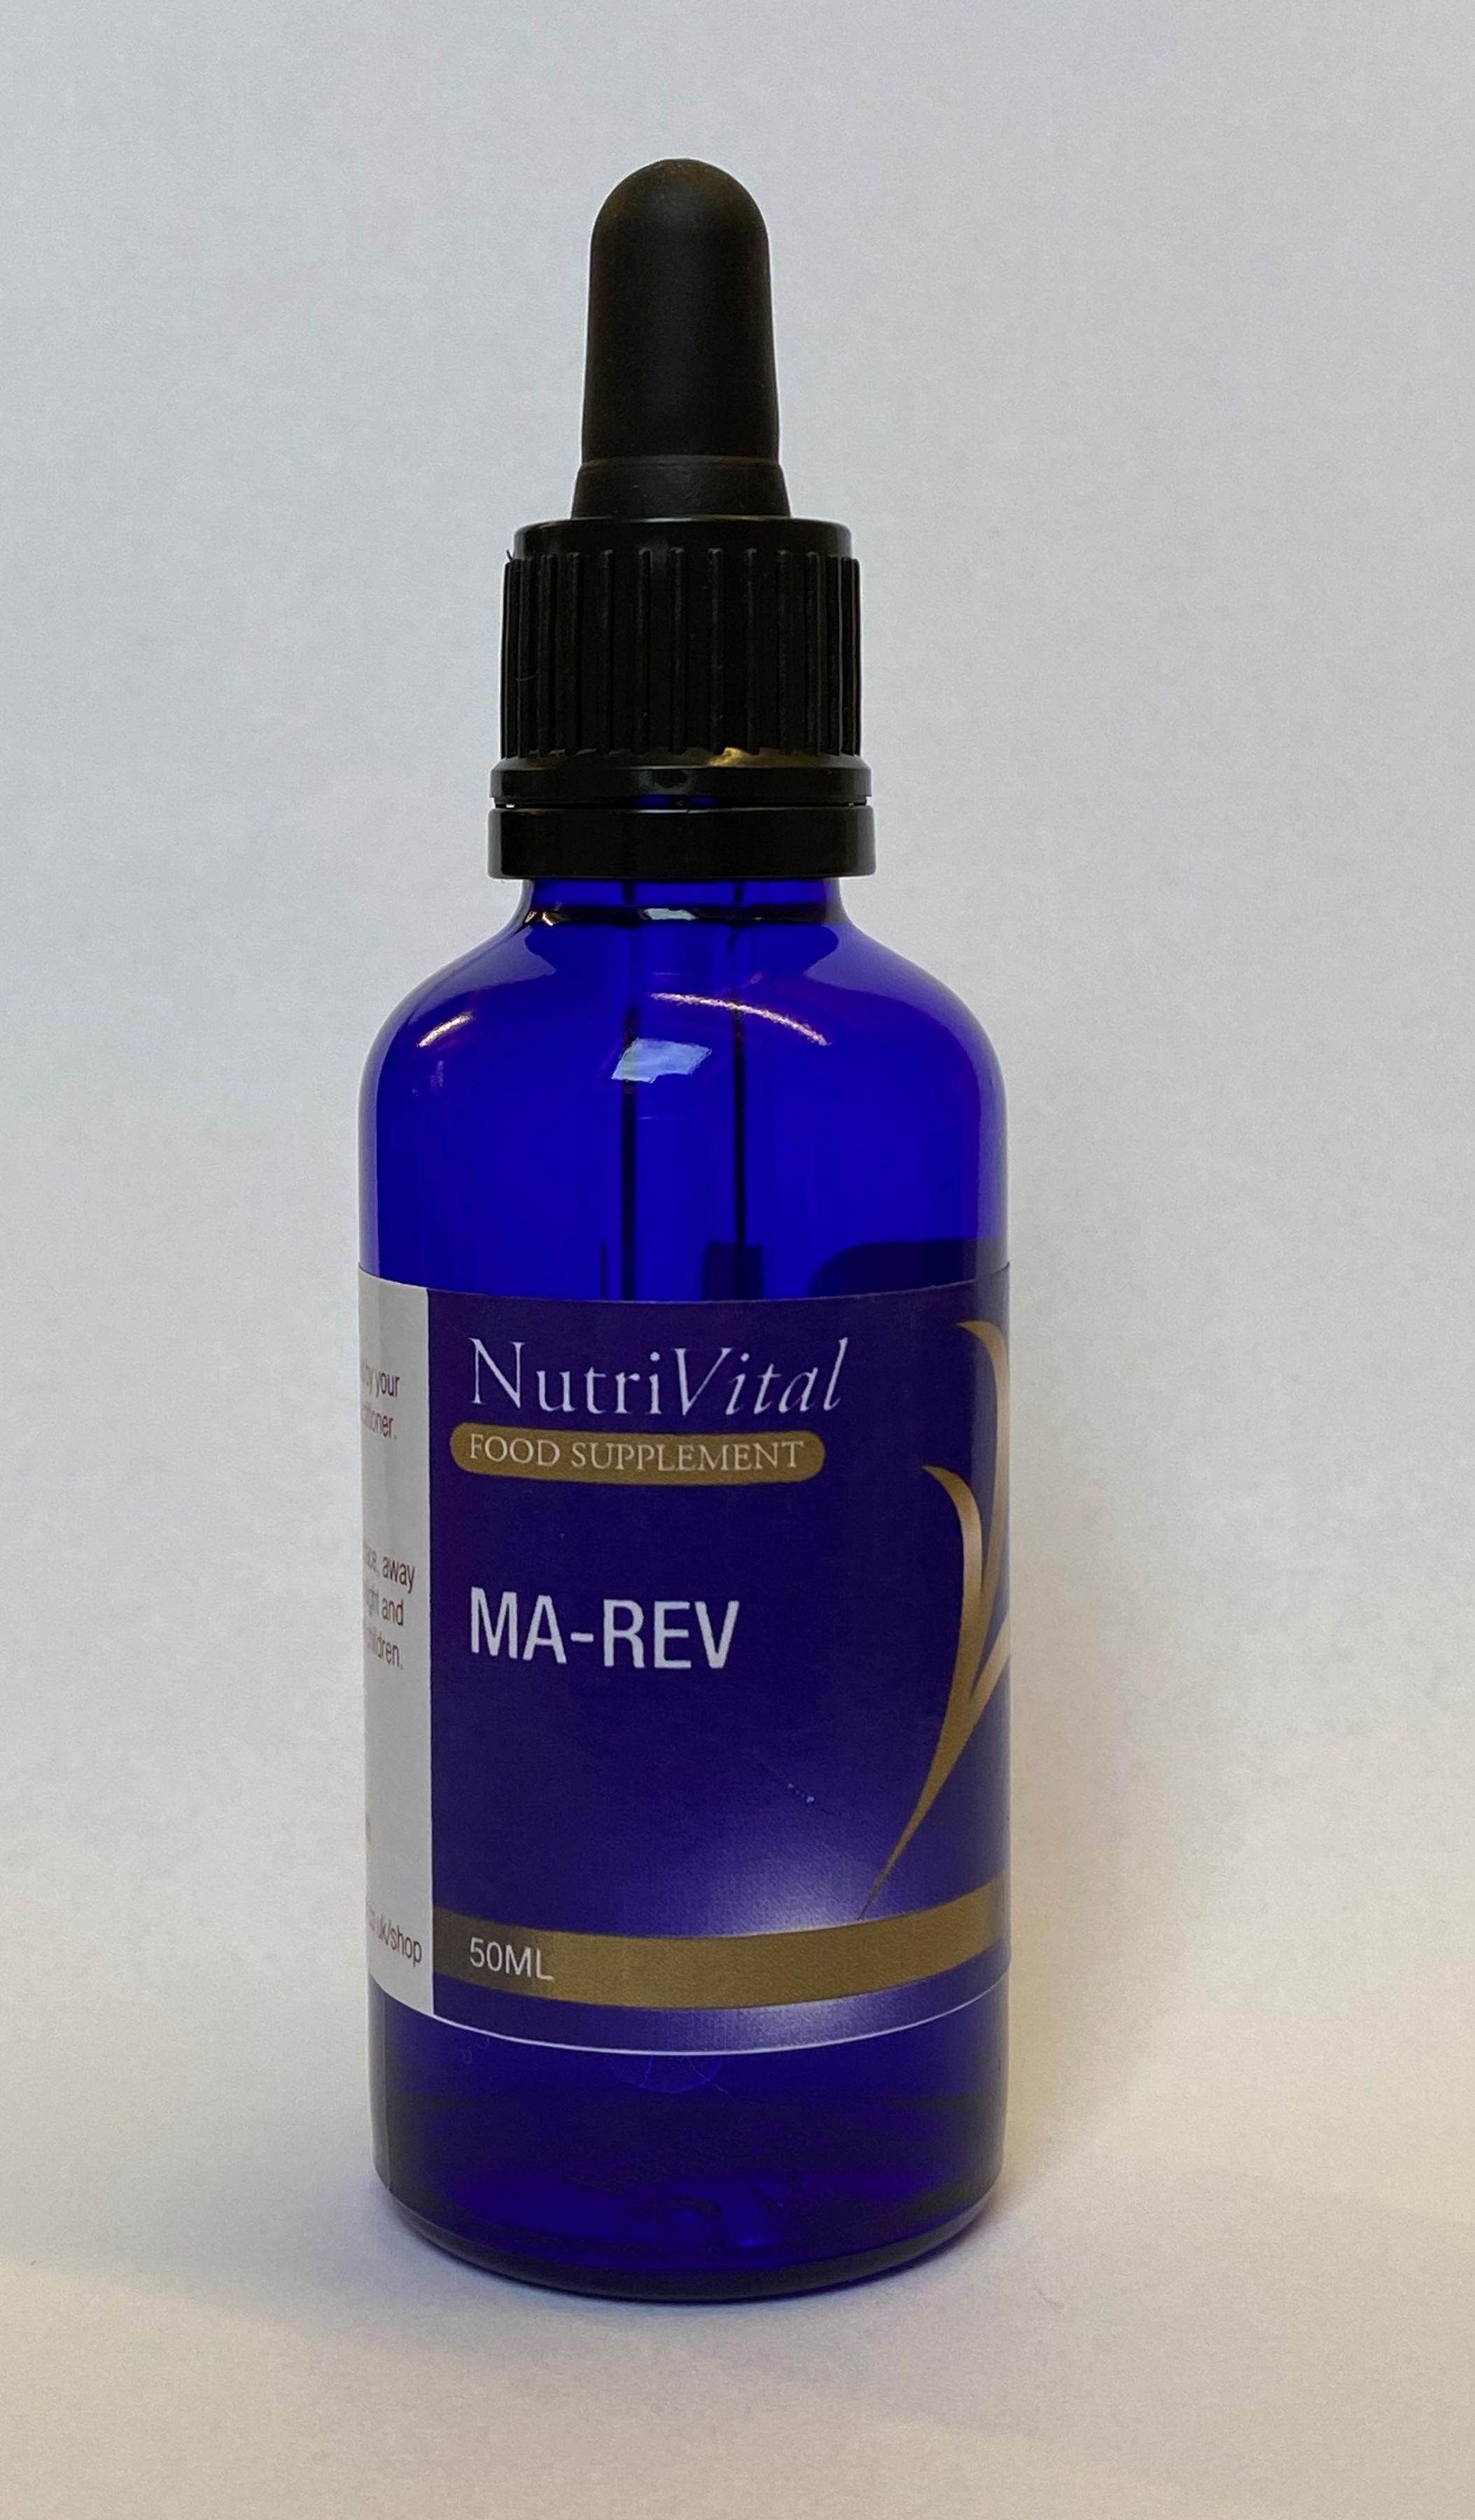 MA-REV 50ml